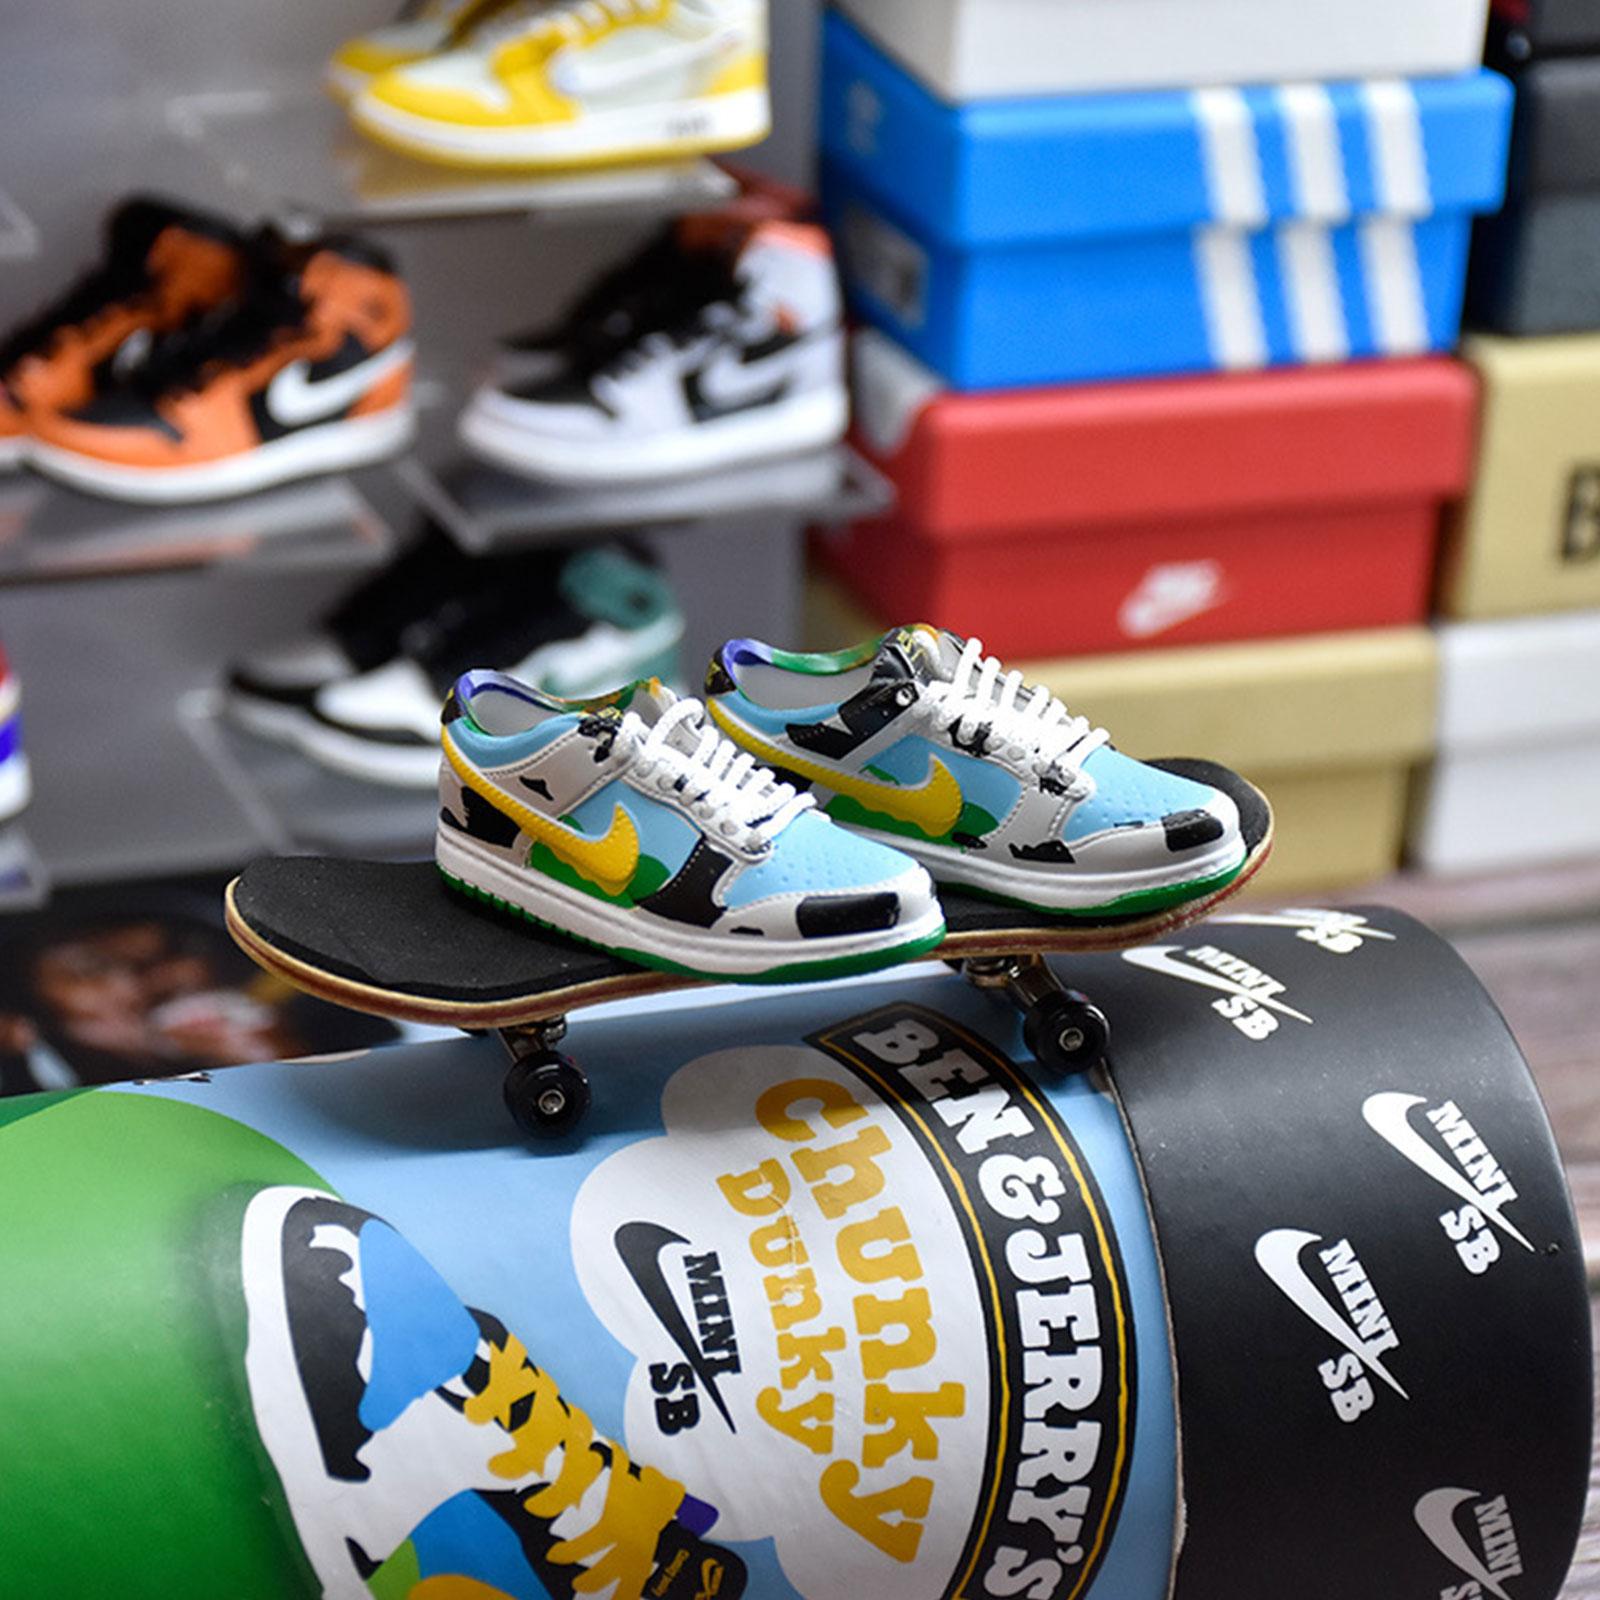 FEAMOS 【Limited Time Sale】Mini NlKE Shoes Finger Skateboard Set ...